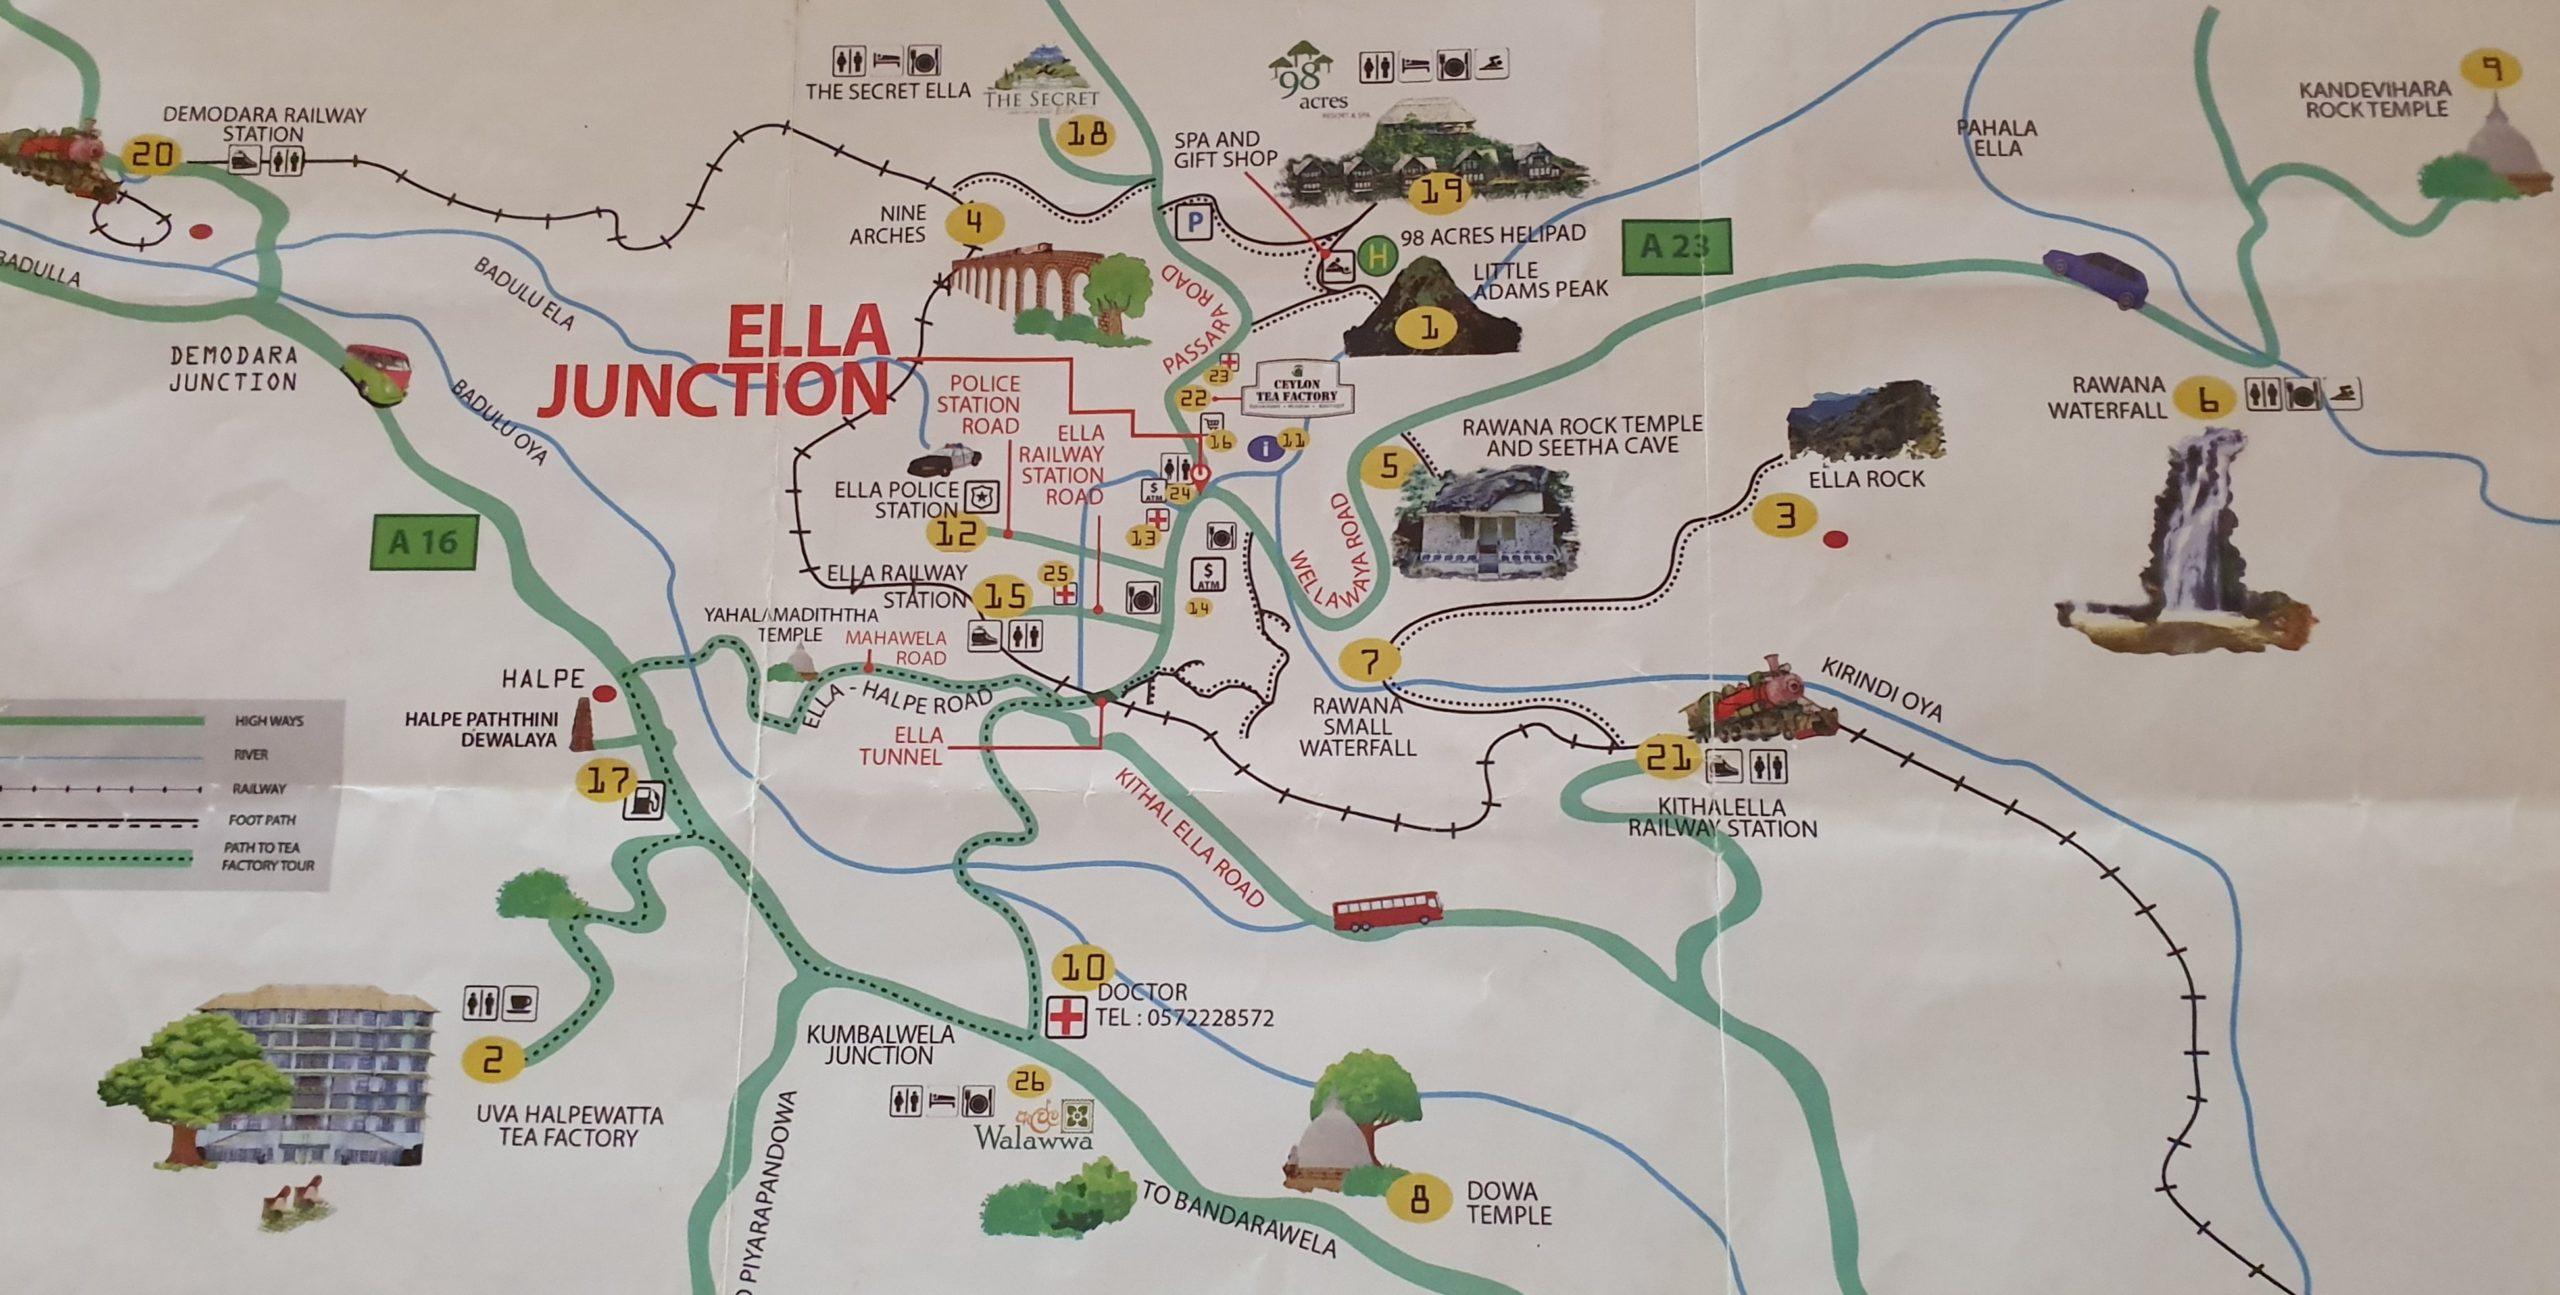 Ella Sri Lanka map Sri Lanka worth doing